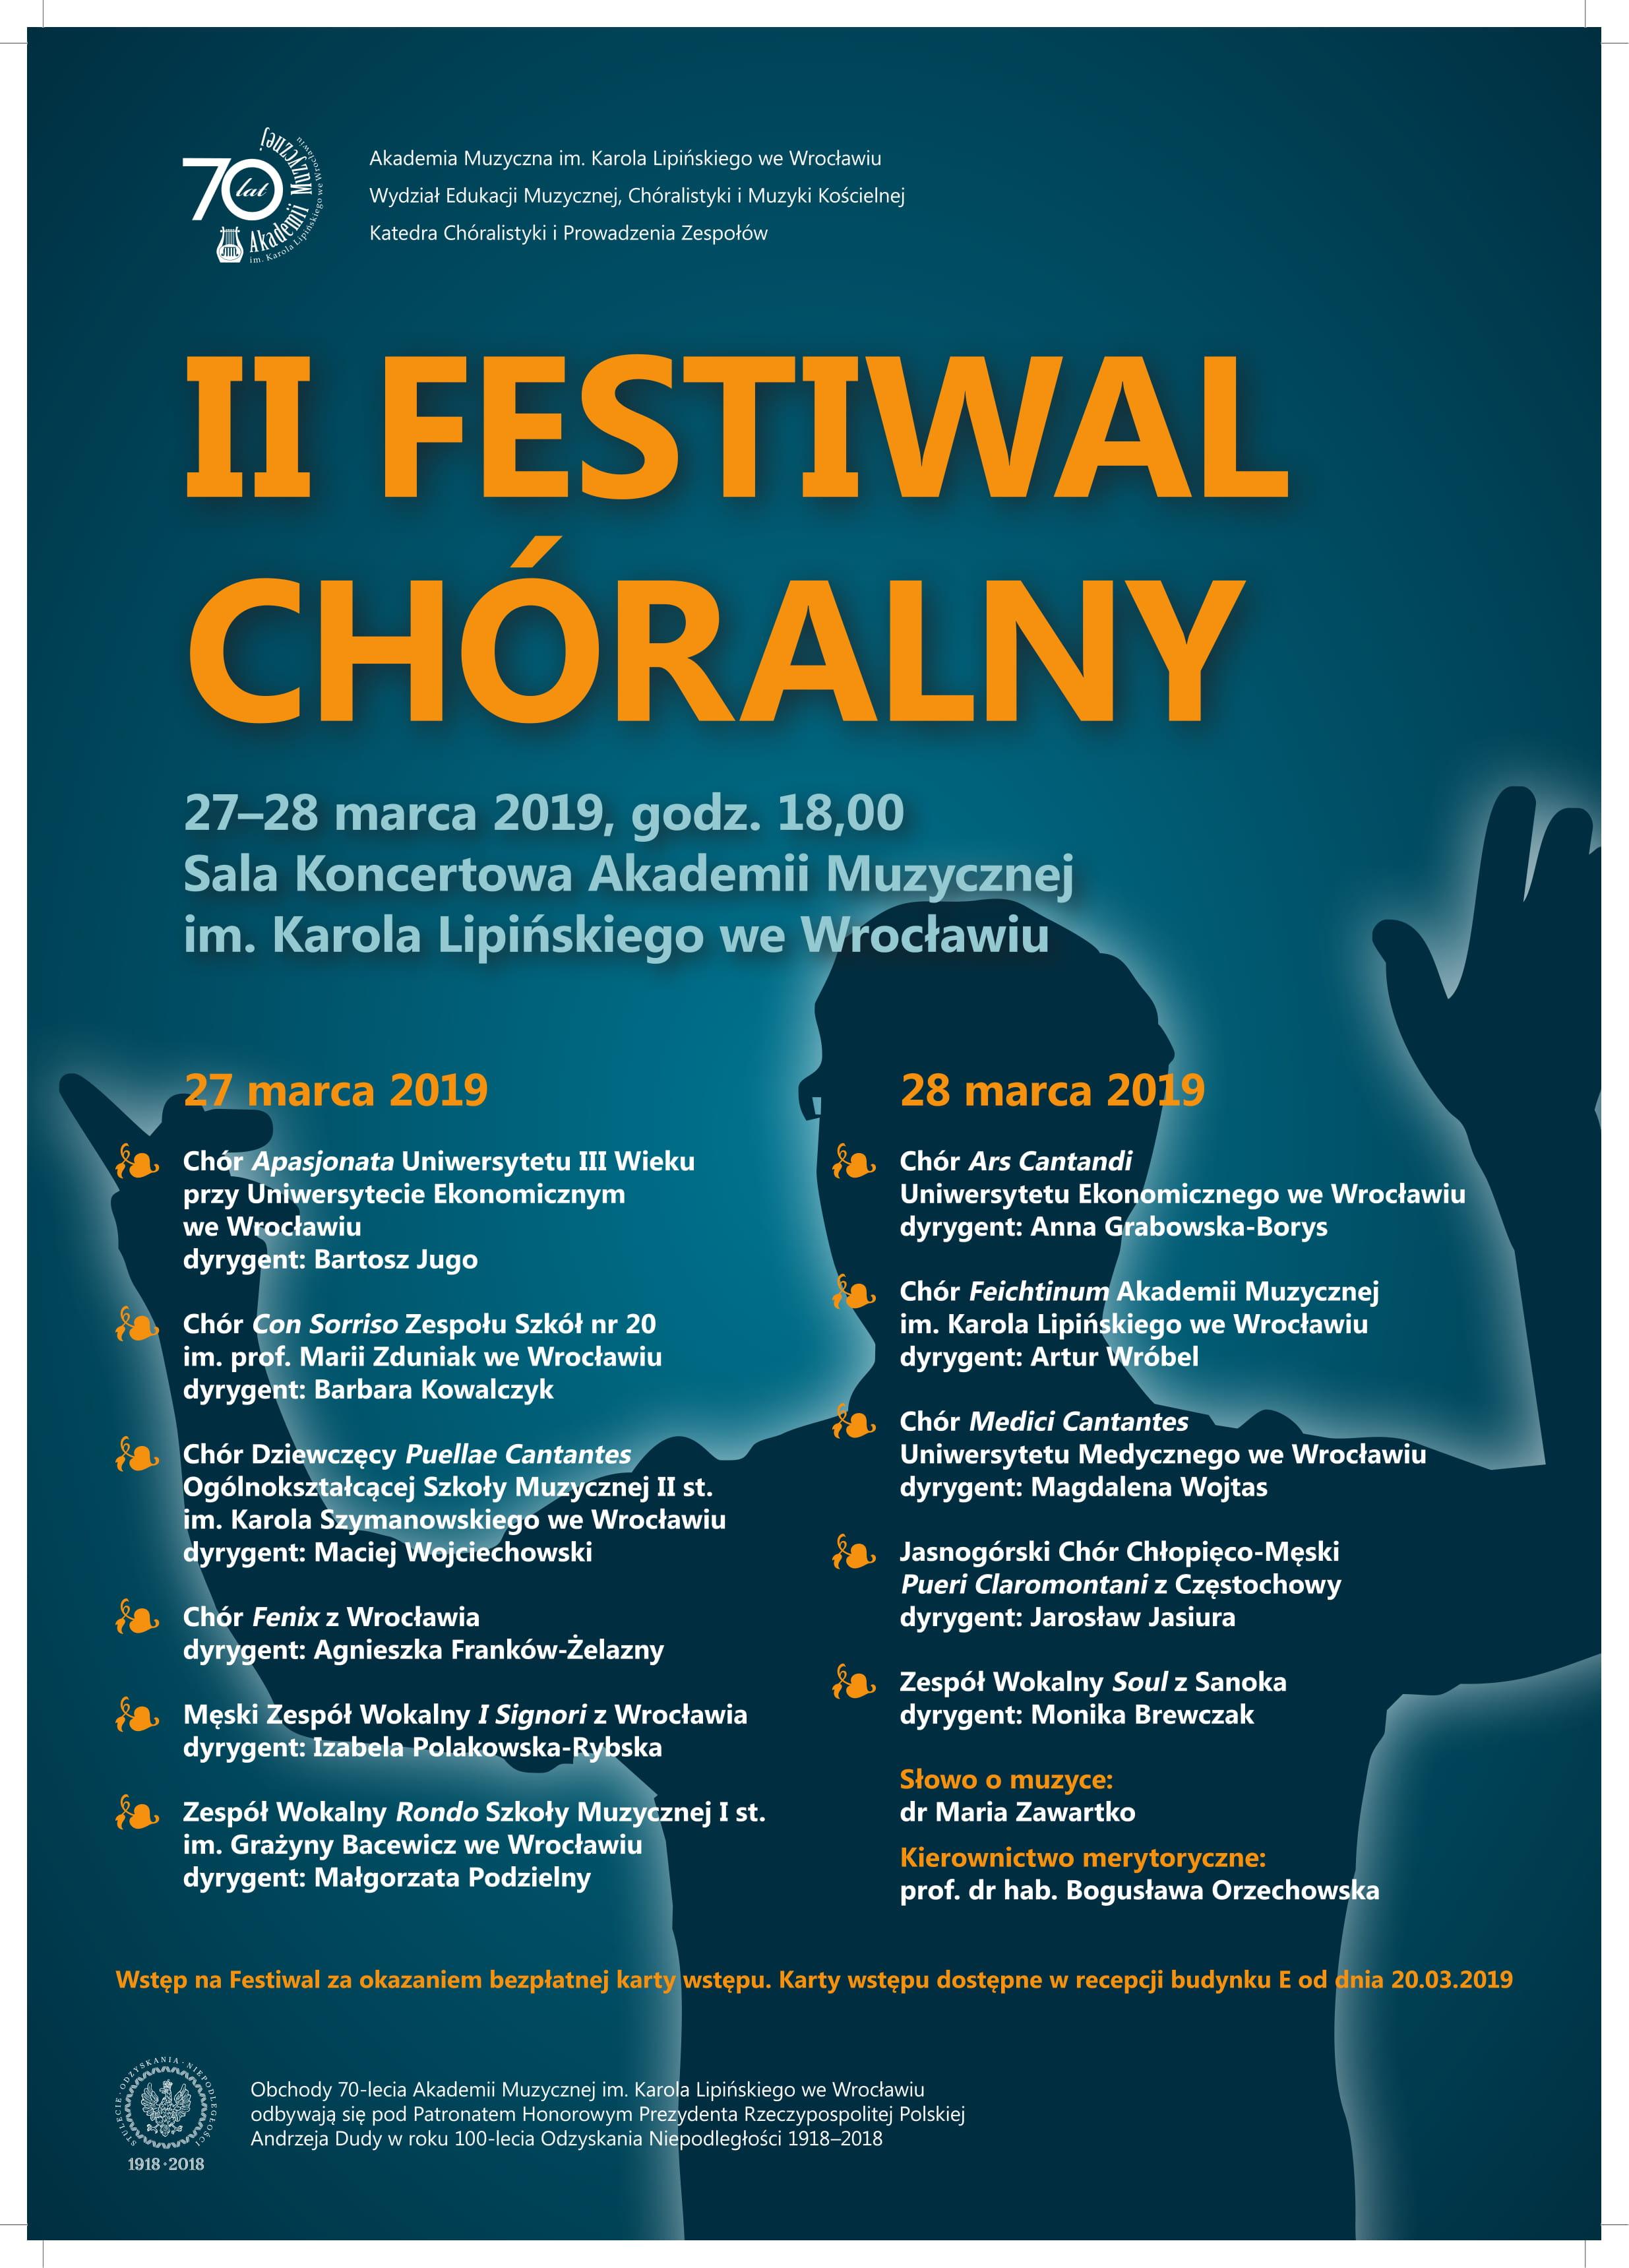 Festiwal Chóralny